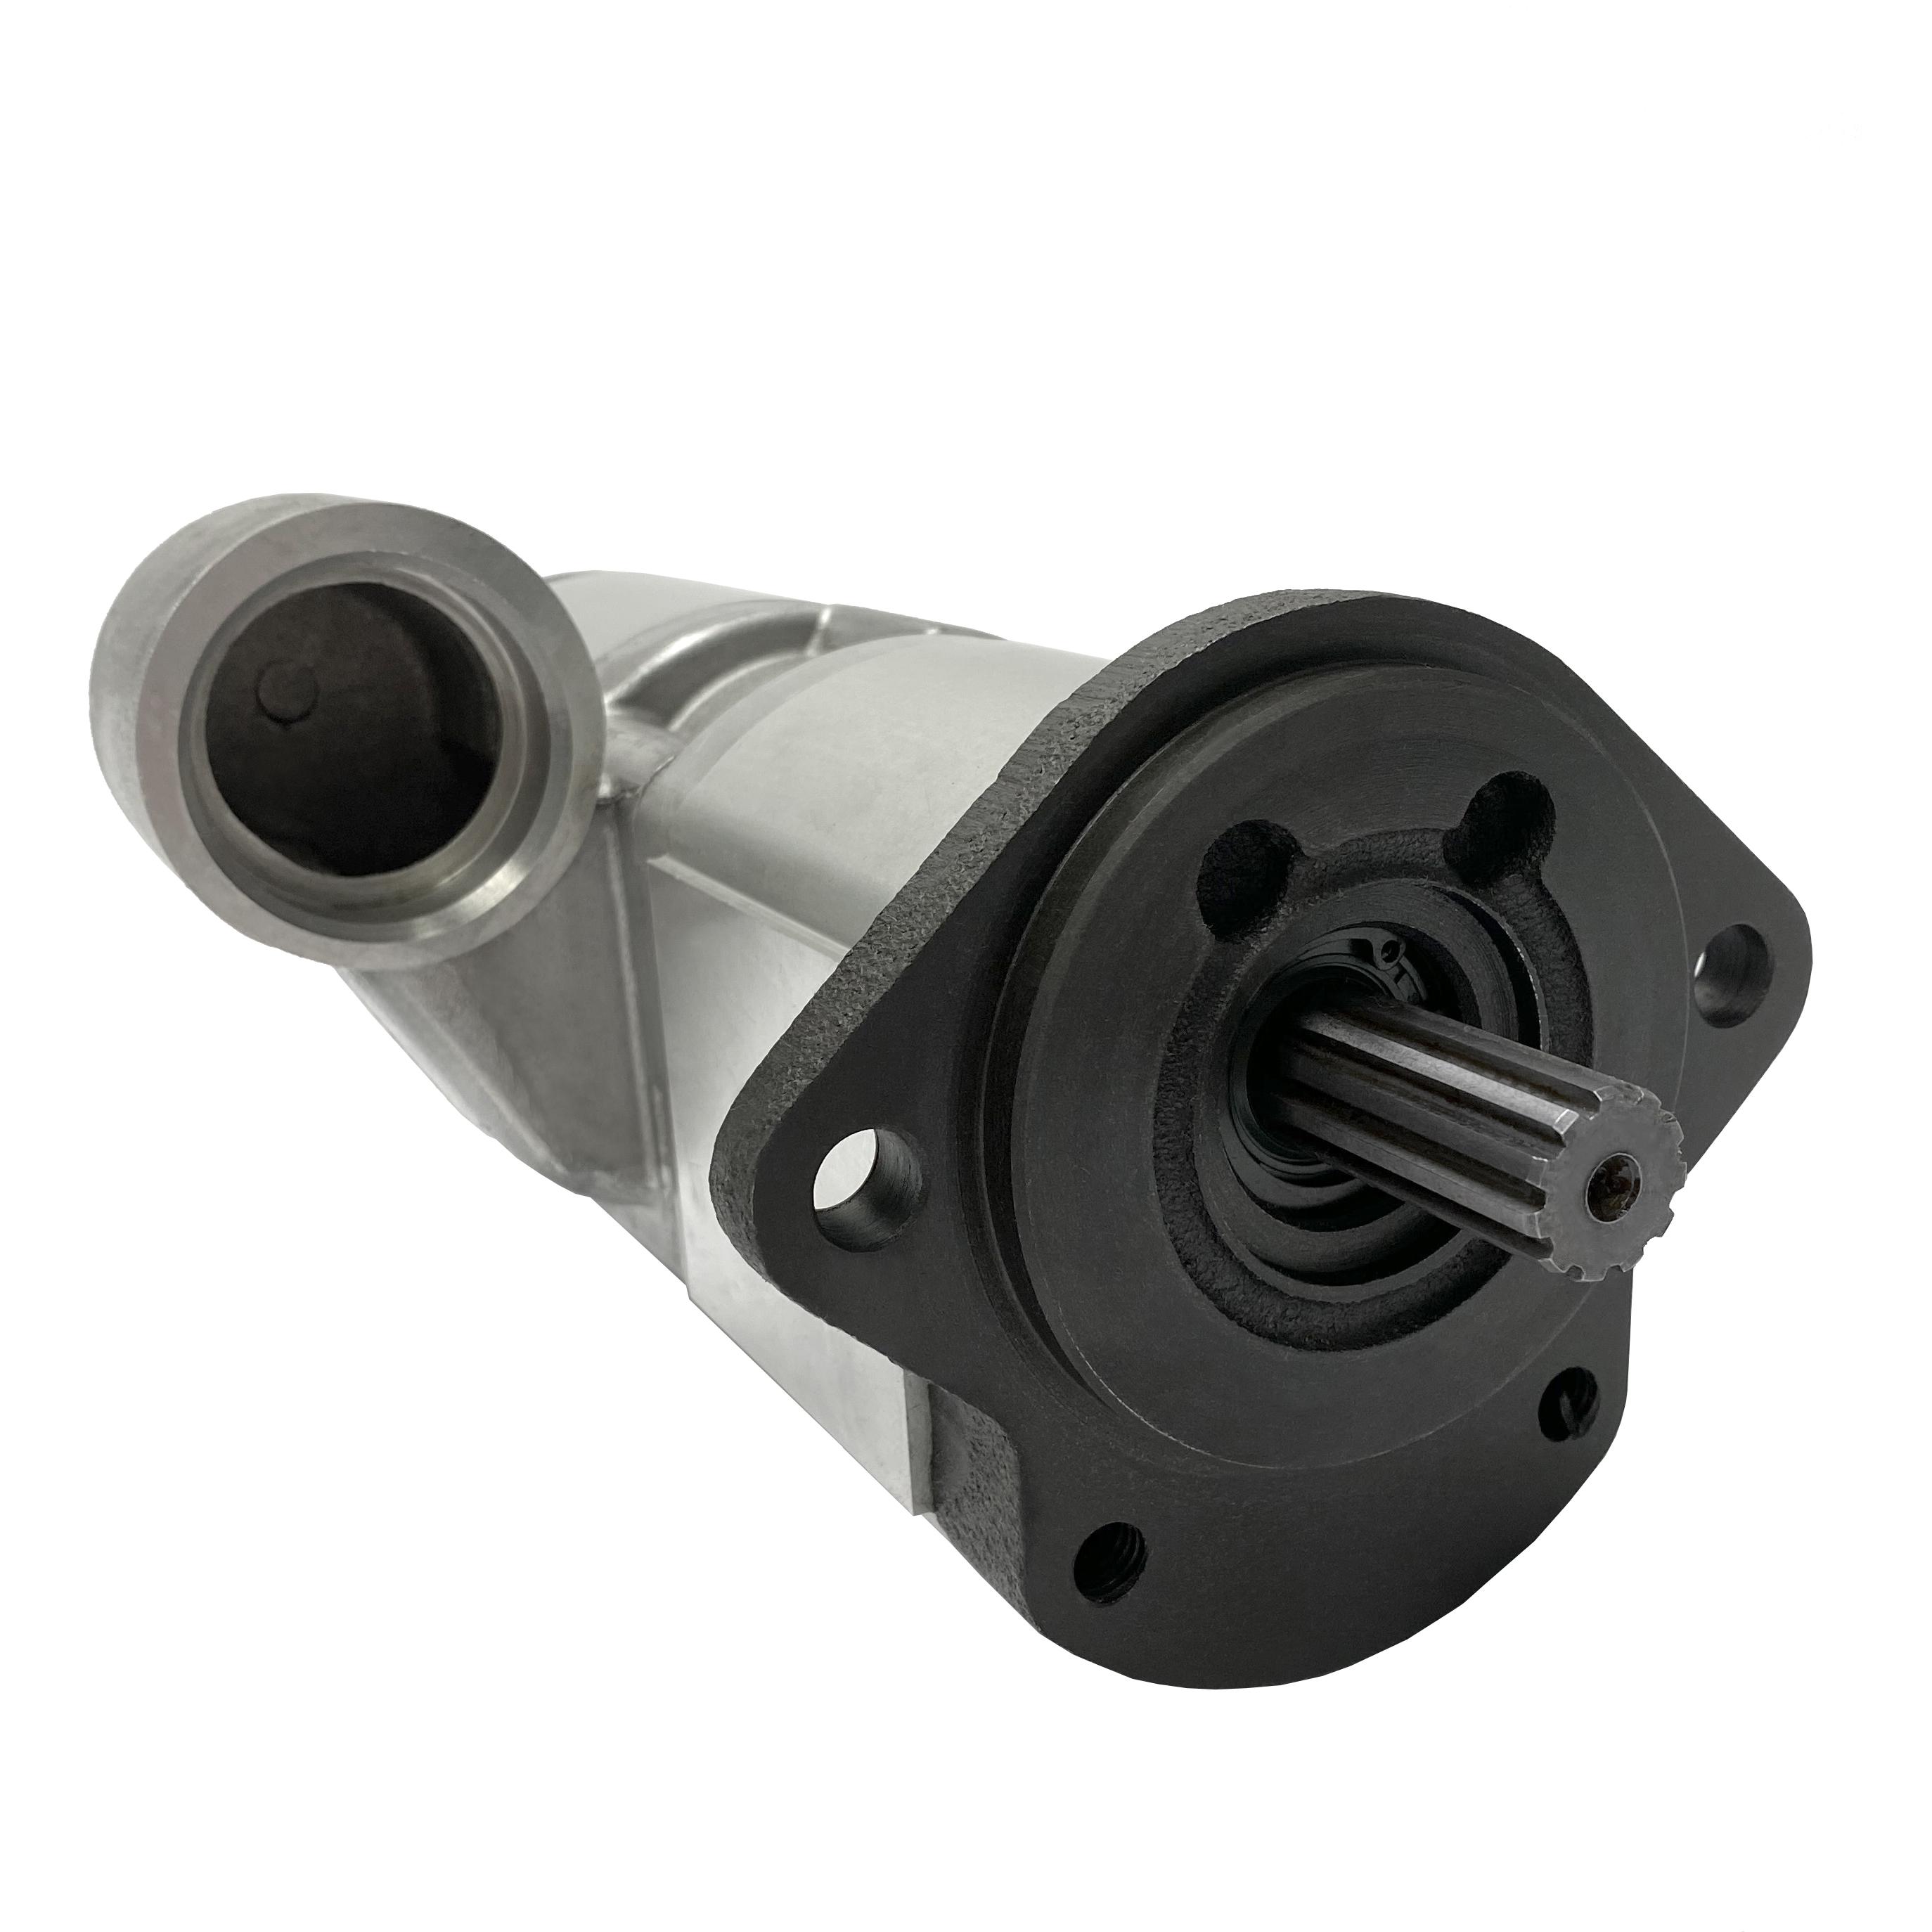 Hydraulic gear pump replacement for Massey Ferguson 3816910M91 | Magister Hydraulics